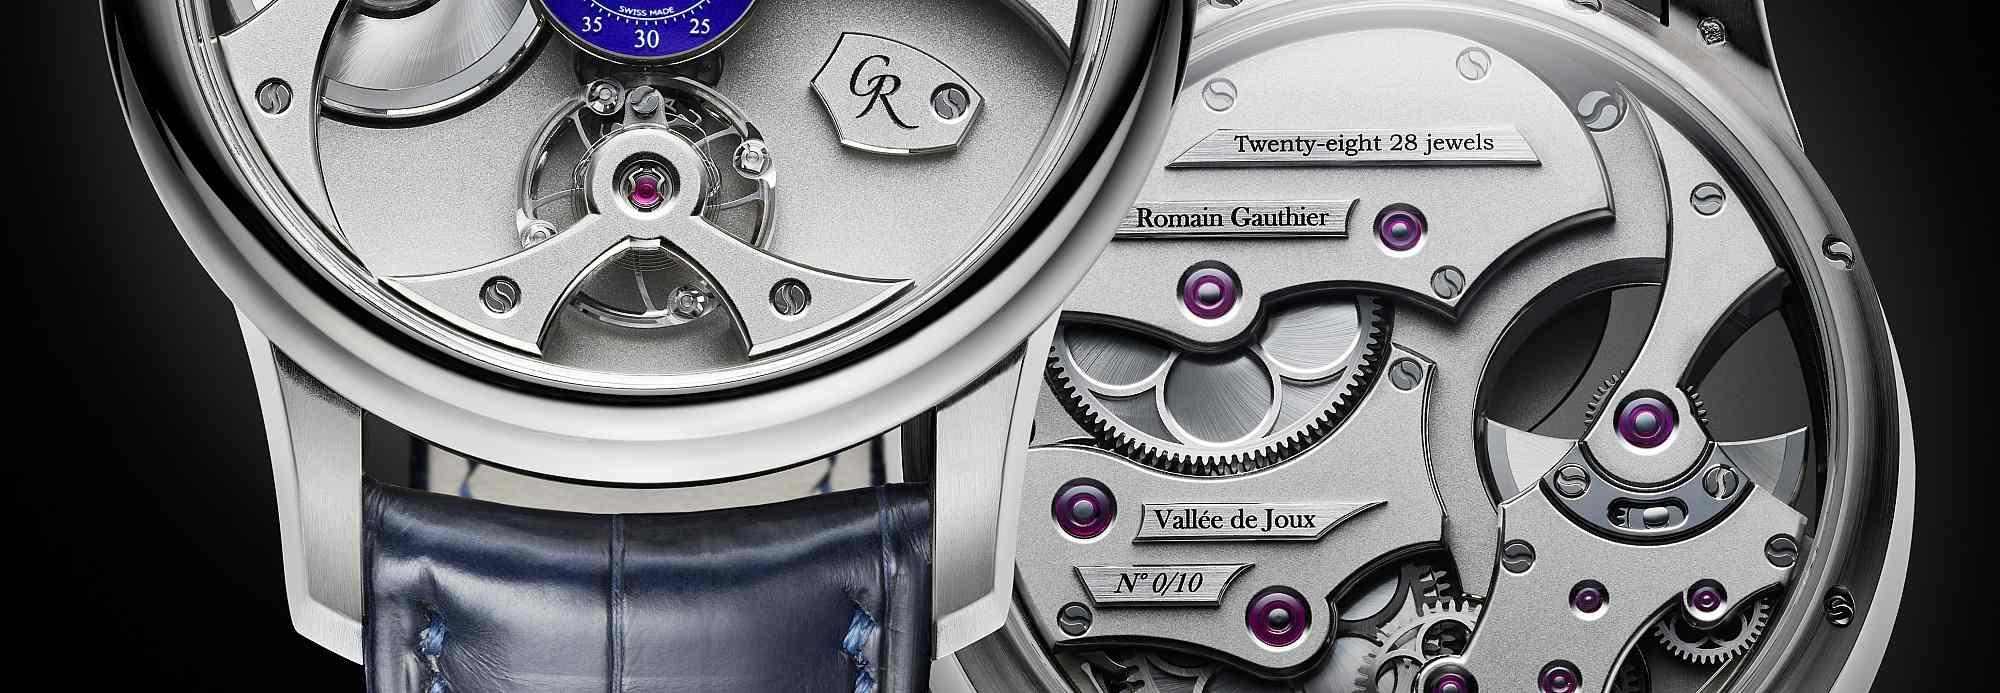 Romain_Gauthier_Insight_Micro-Rotor_platinum_6_blue_enamel_dial